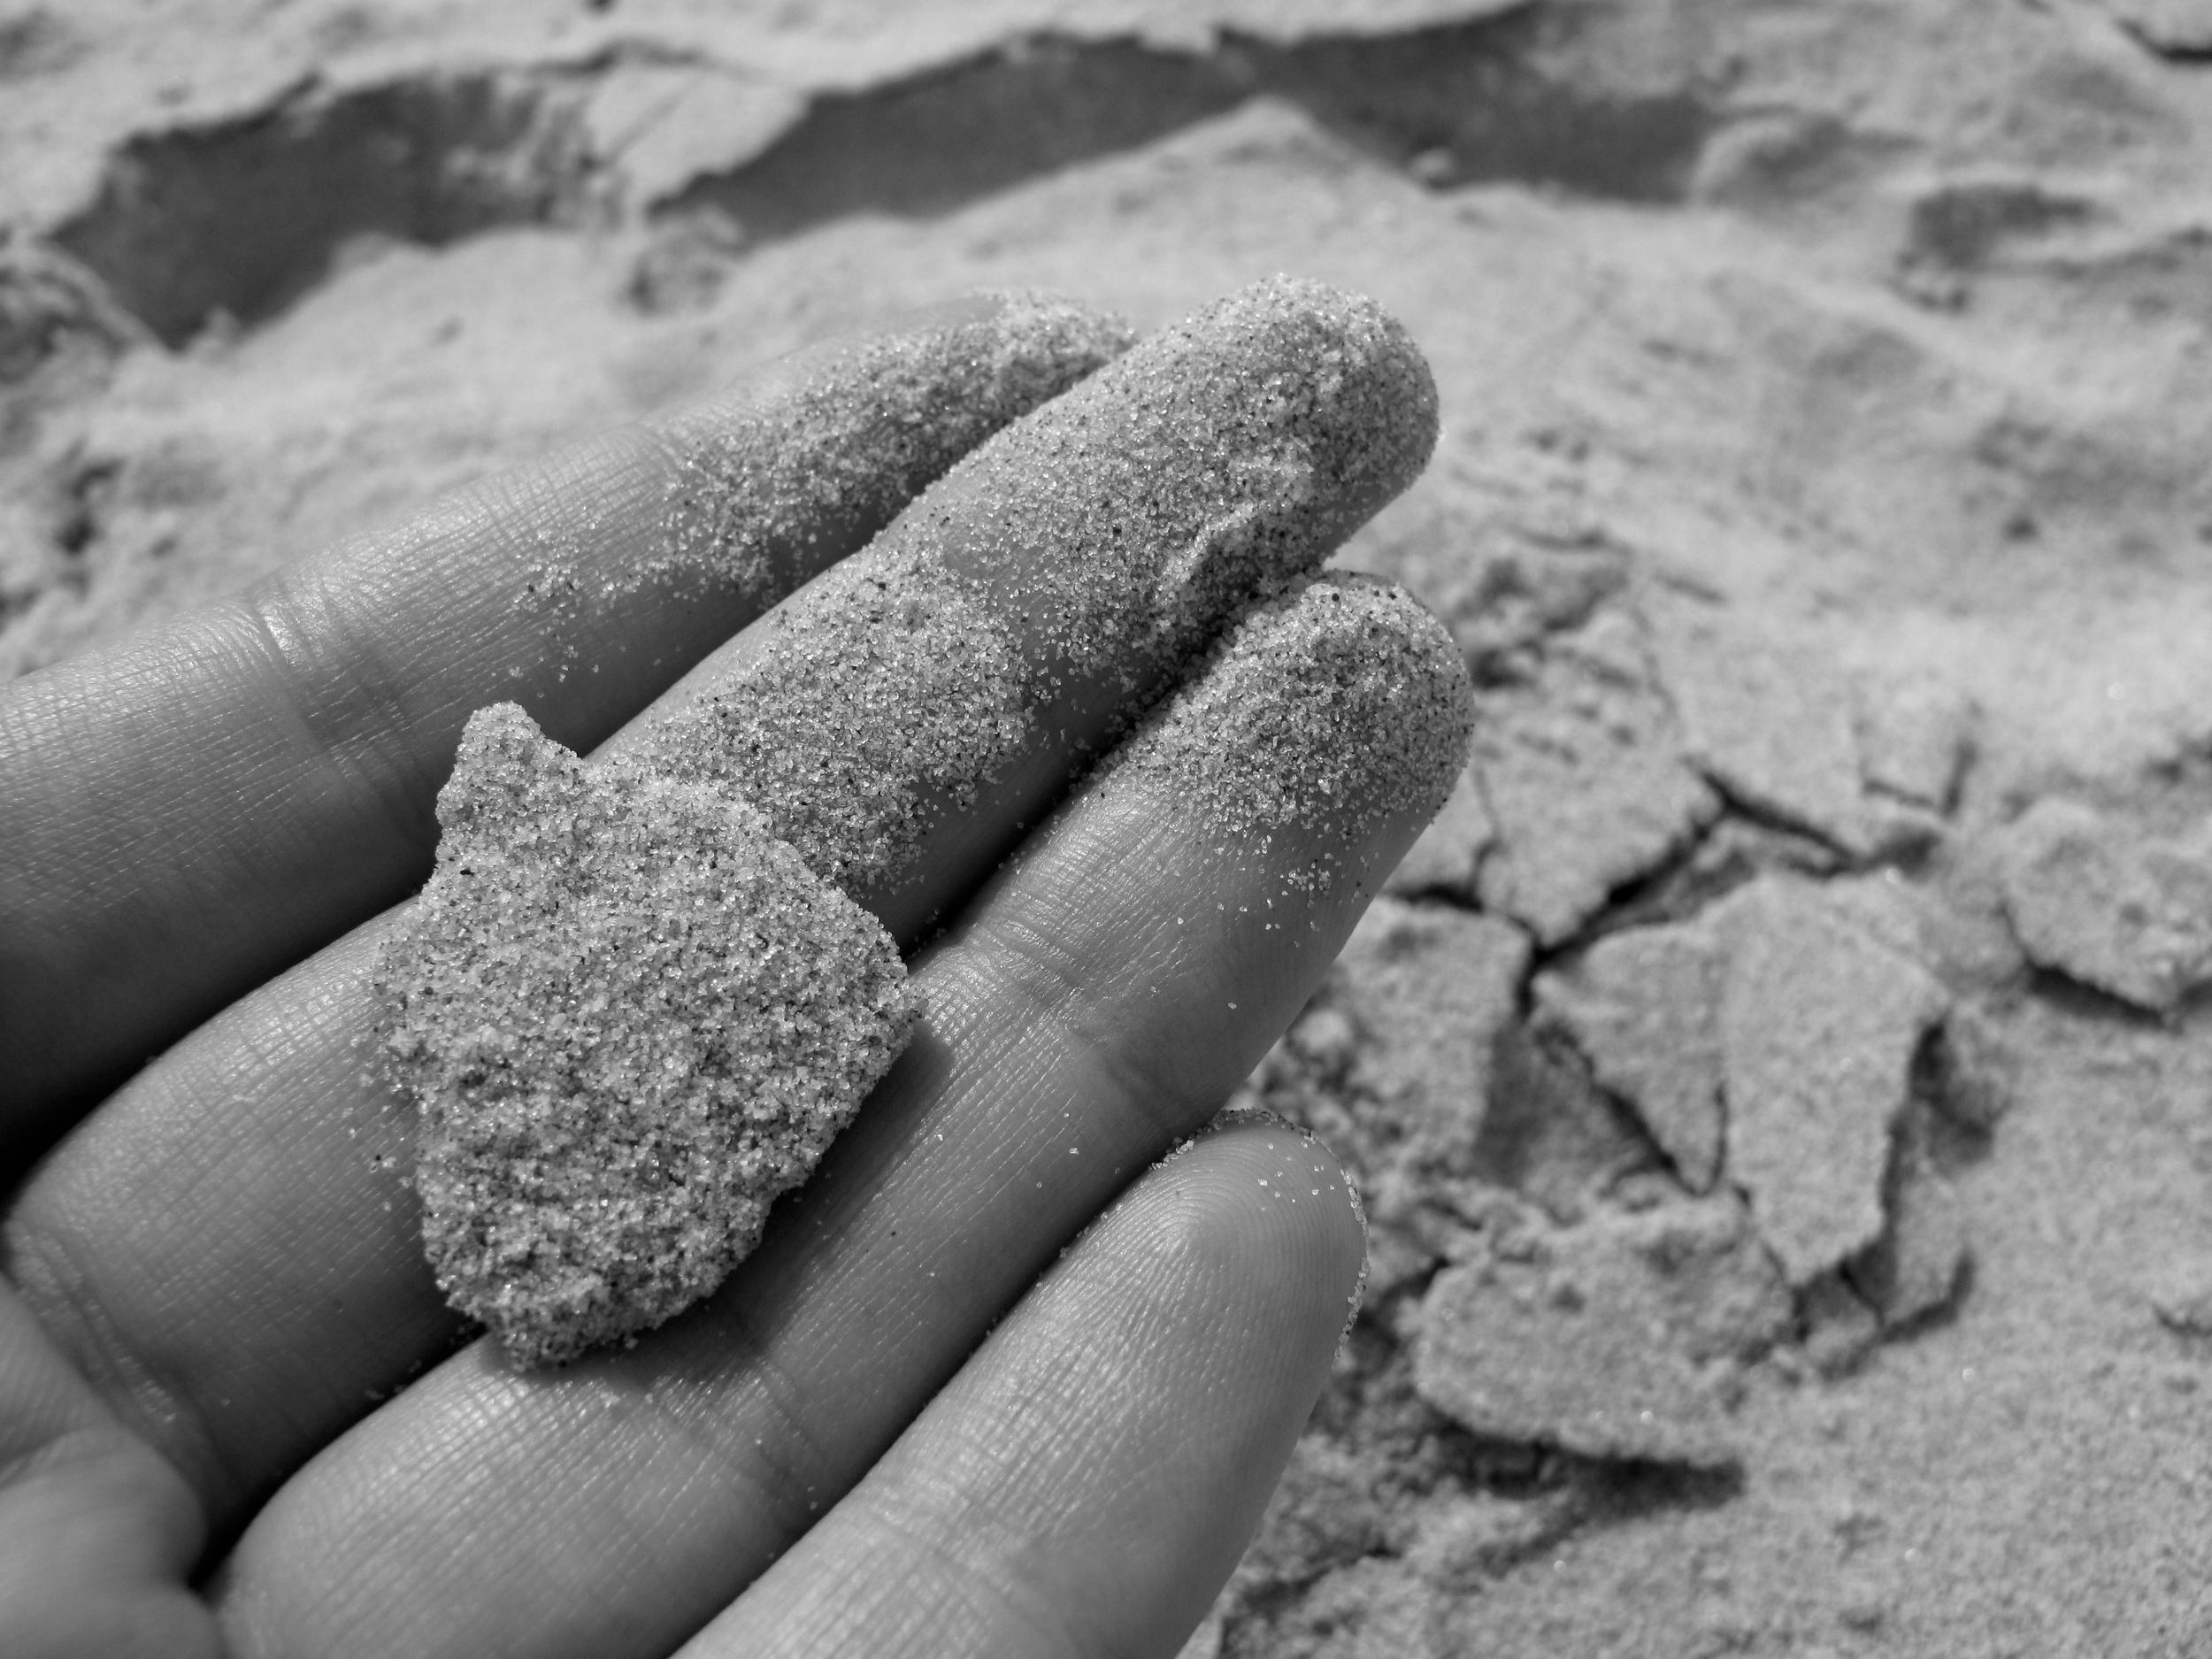 sand cakes